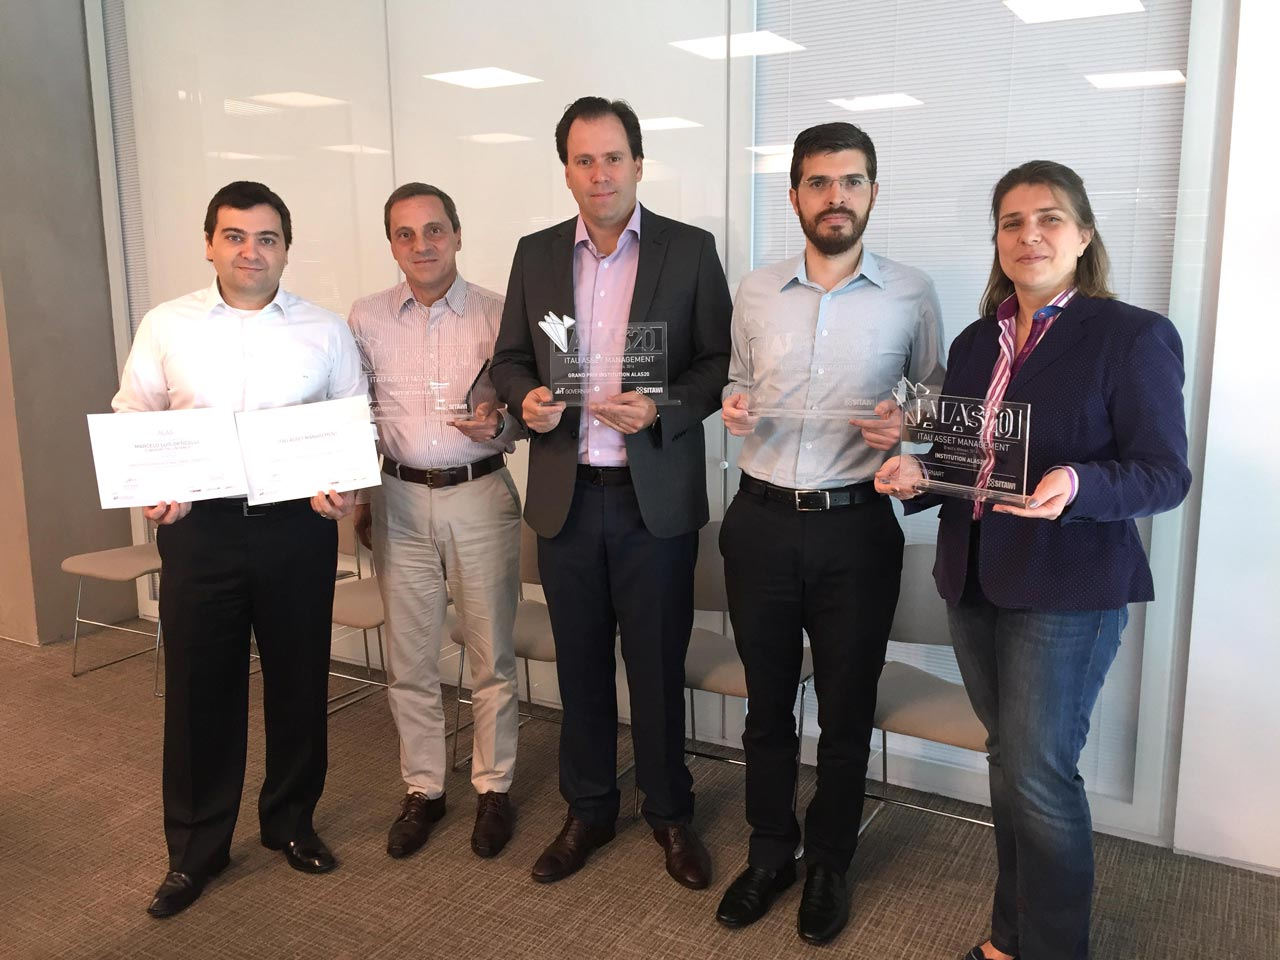 ITAÚ ASSET MANAGEMENT Brasil Ganador Grand Prix ALAS20 2016